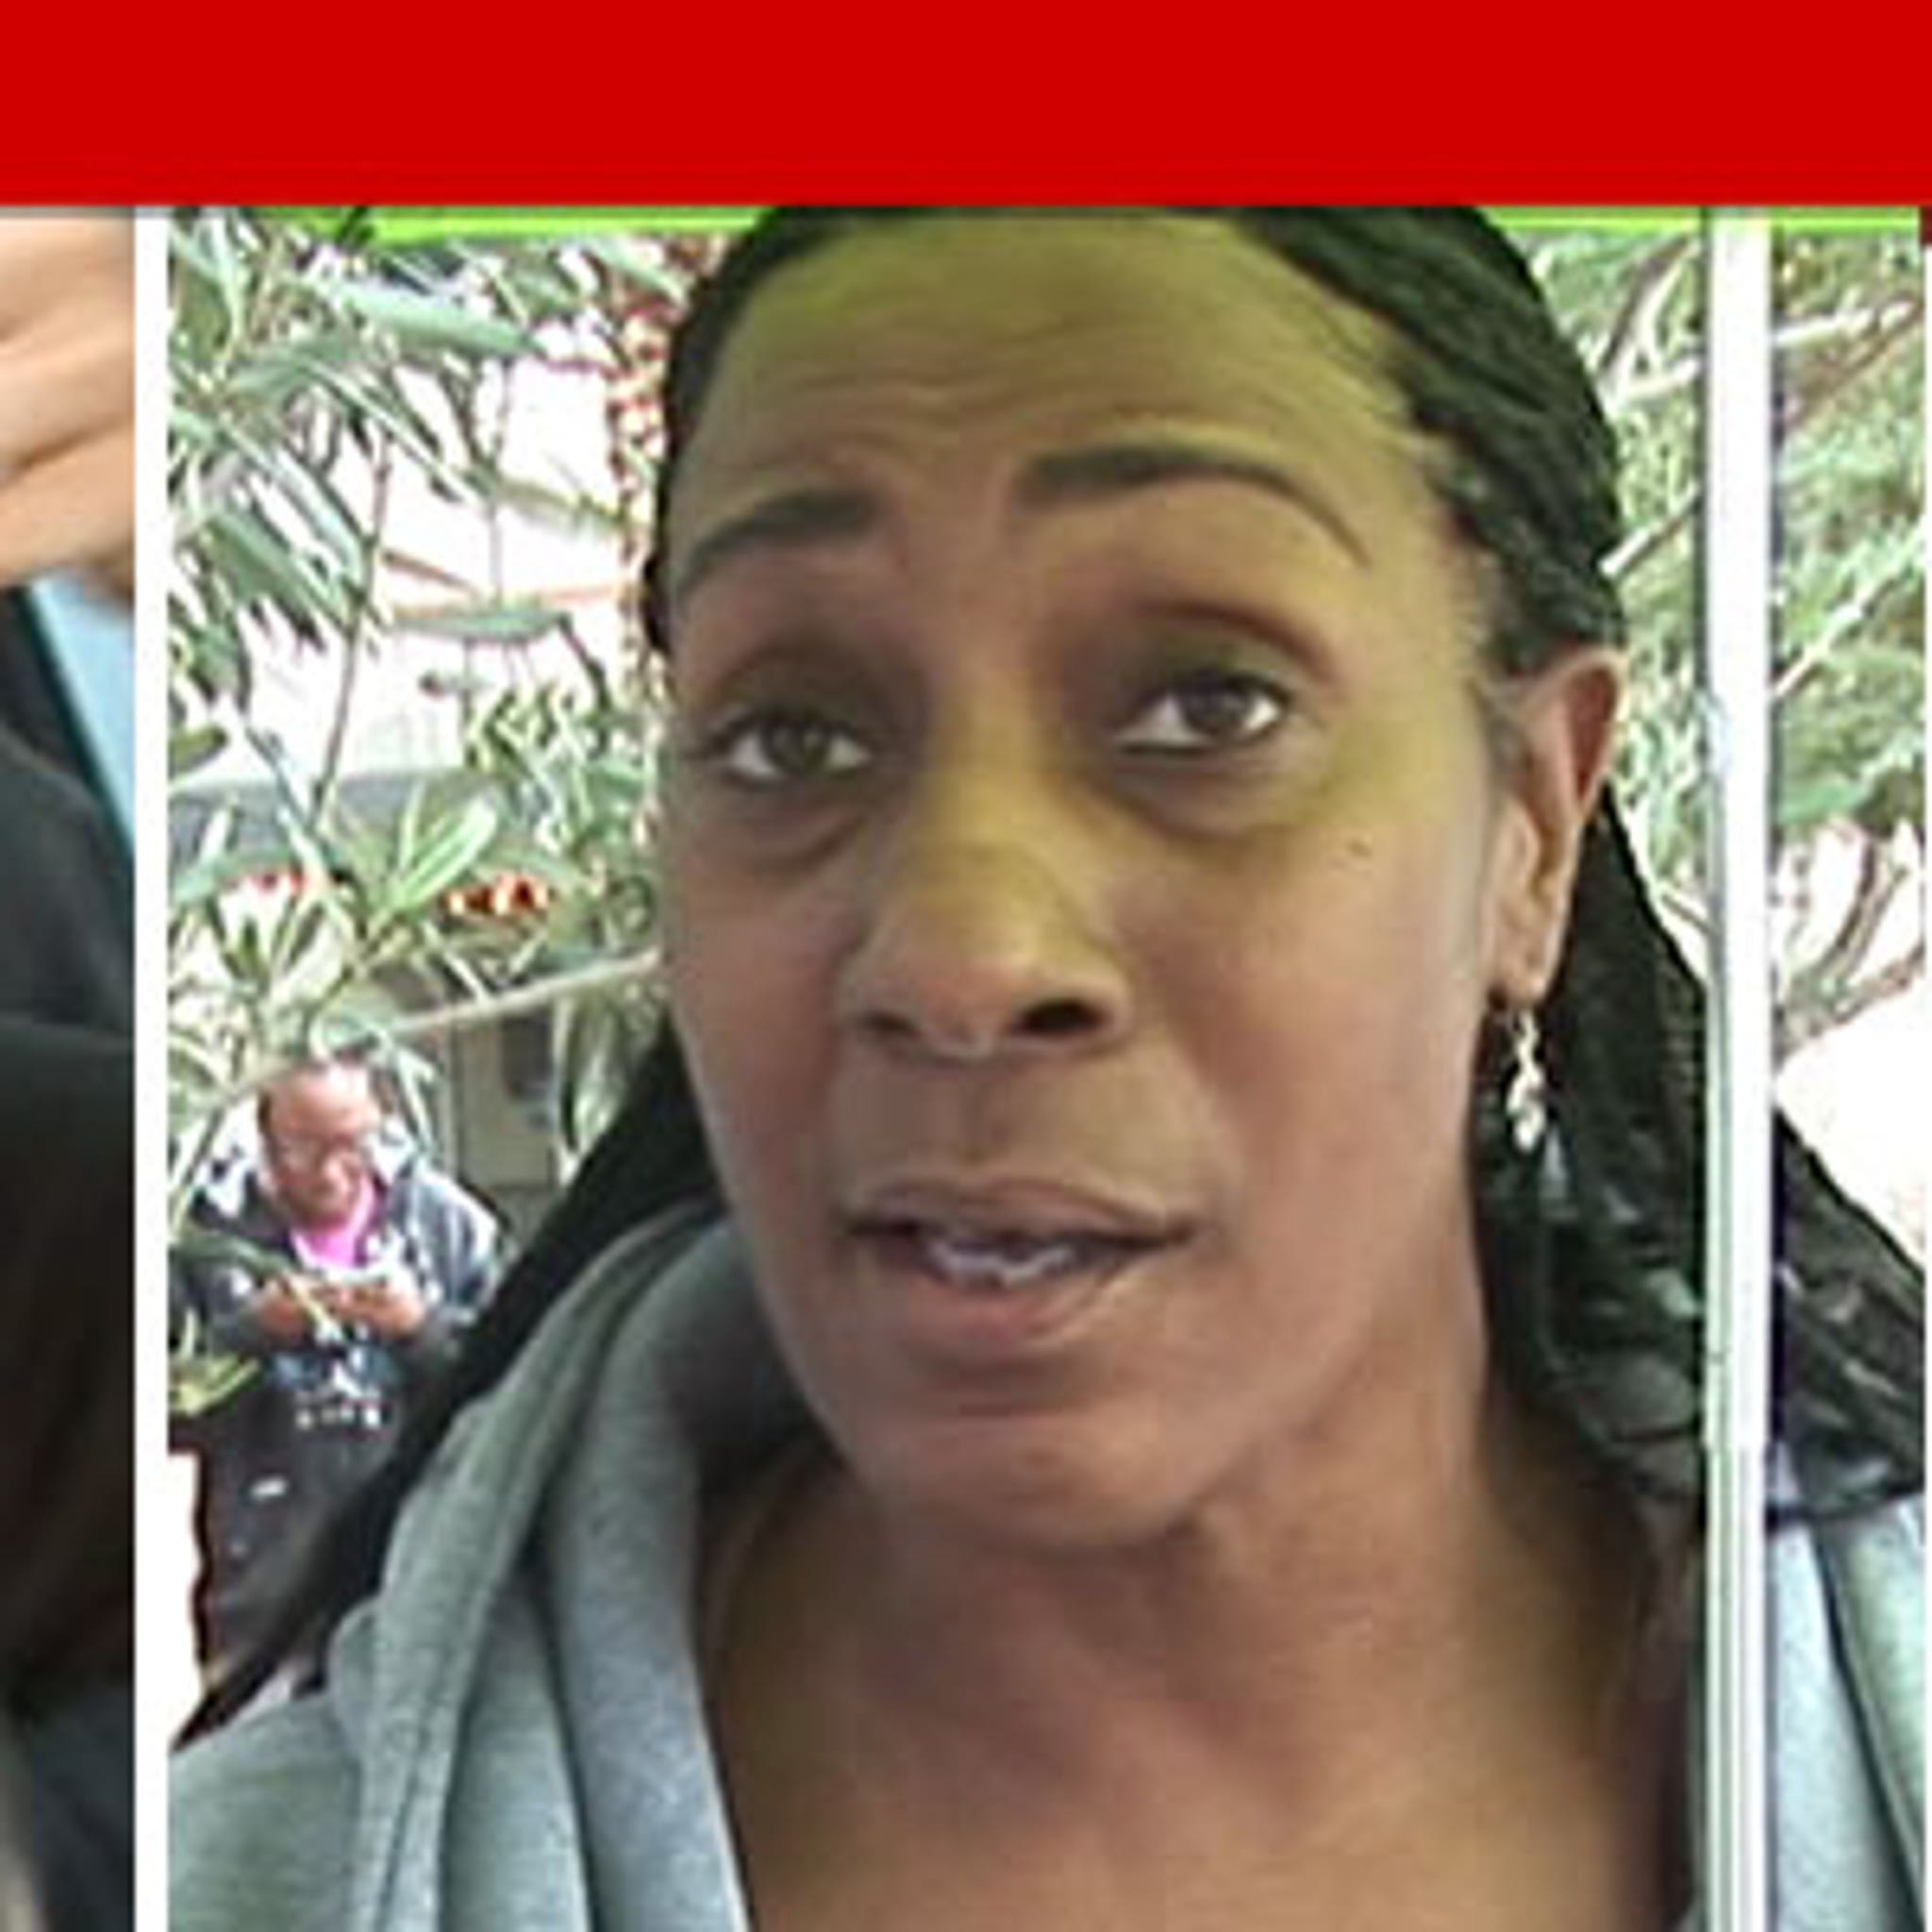 Lindsay Lohan -- Mystery Probation Violations